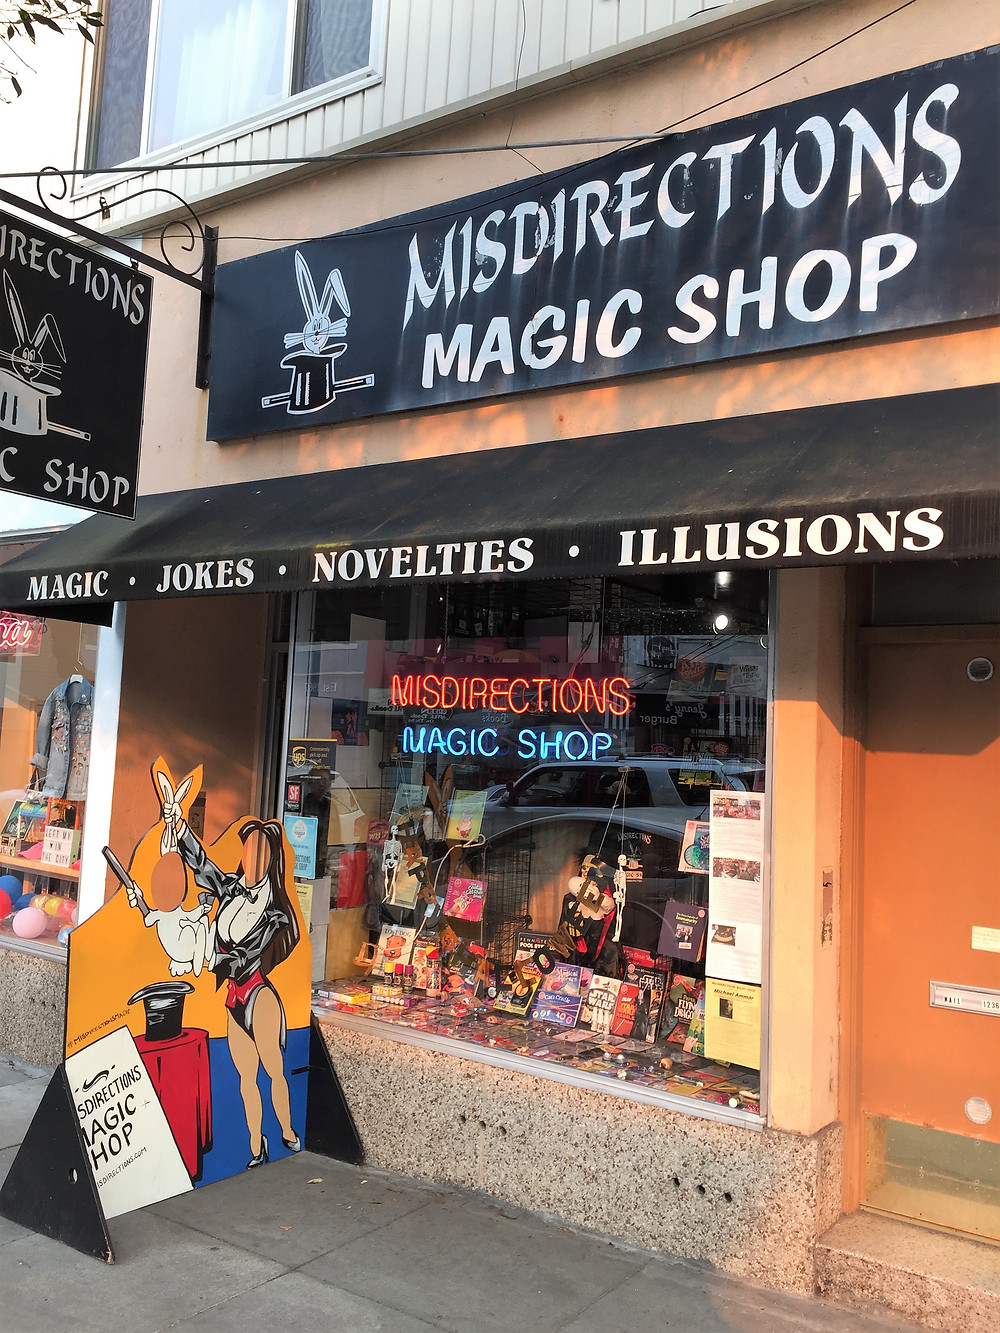 Misdirections Magic Shop